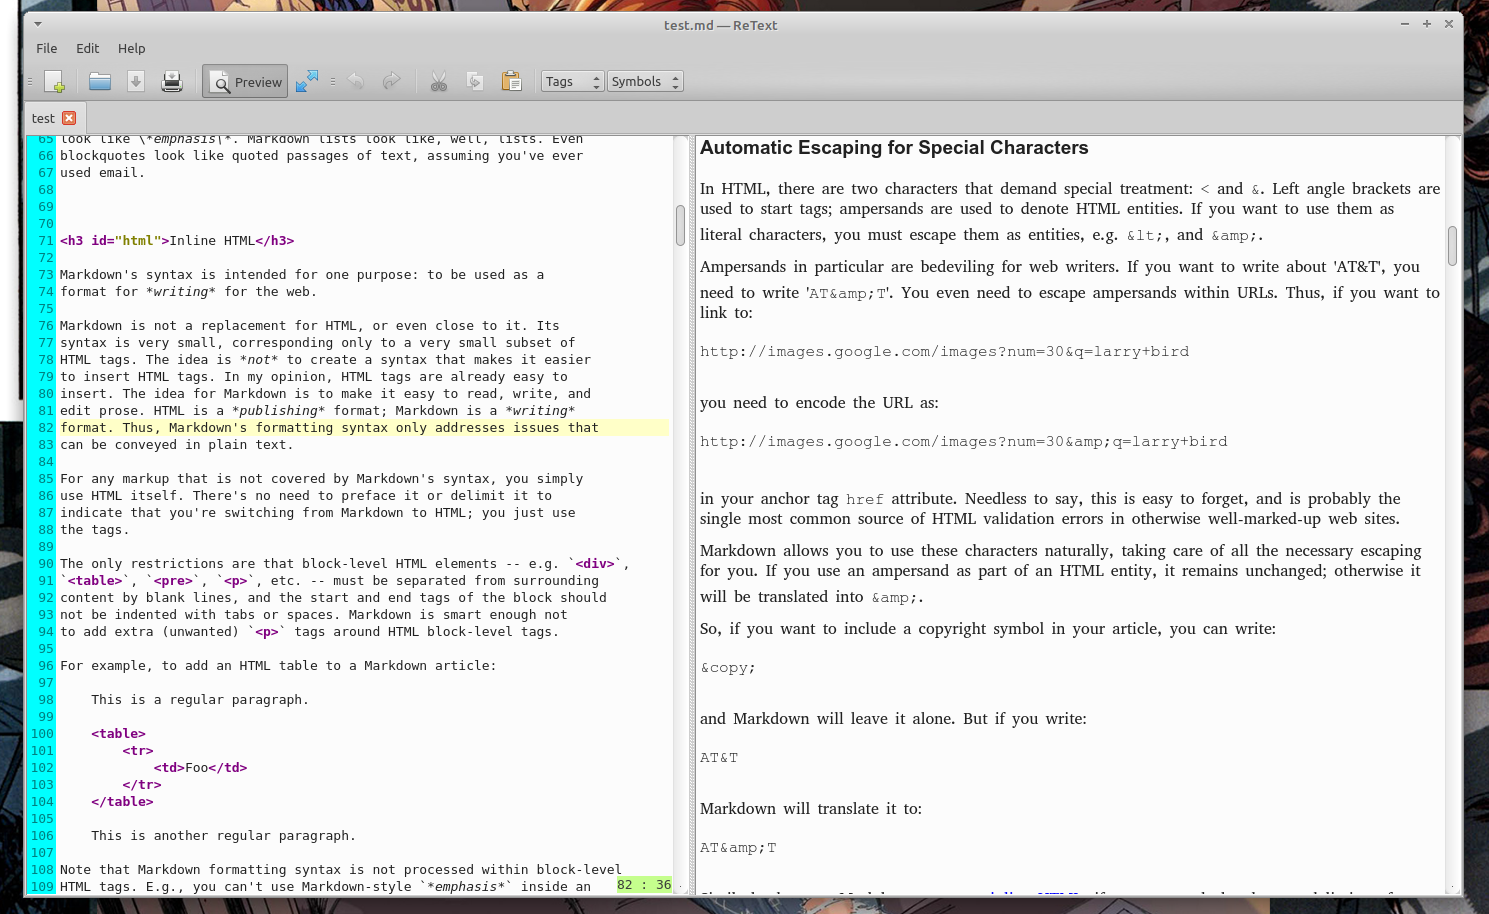 ReText - хороший Markdown редактор